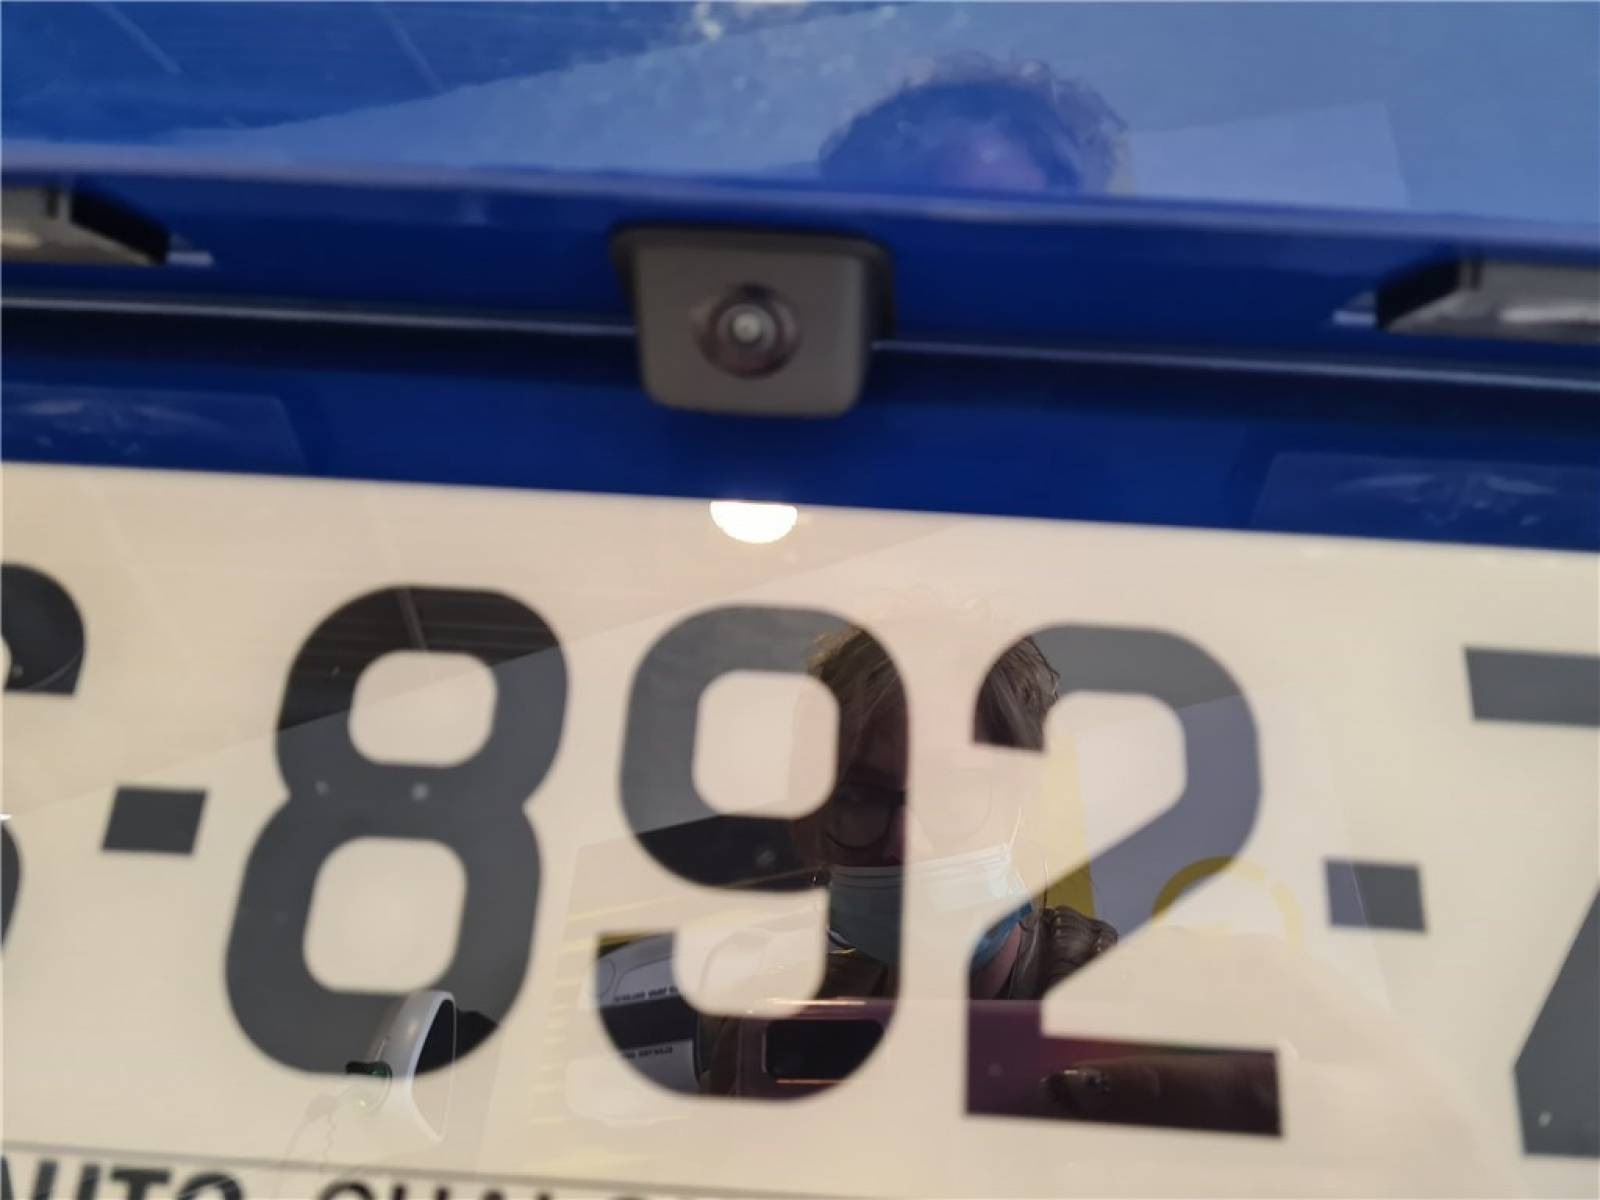 OPEL Corsa 1.2 Turbo 100 ch BVM6 - véhicule d'occasion - Groupe Guillet - Opel Magicauto - Chalon-sur-Saône - 71380 - Saint-Marcel - 9